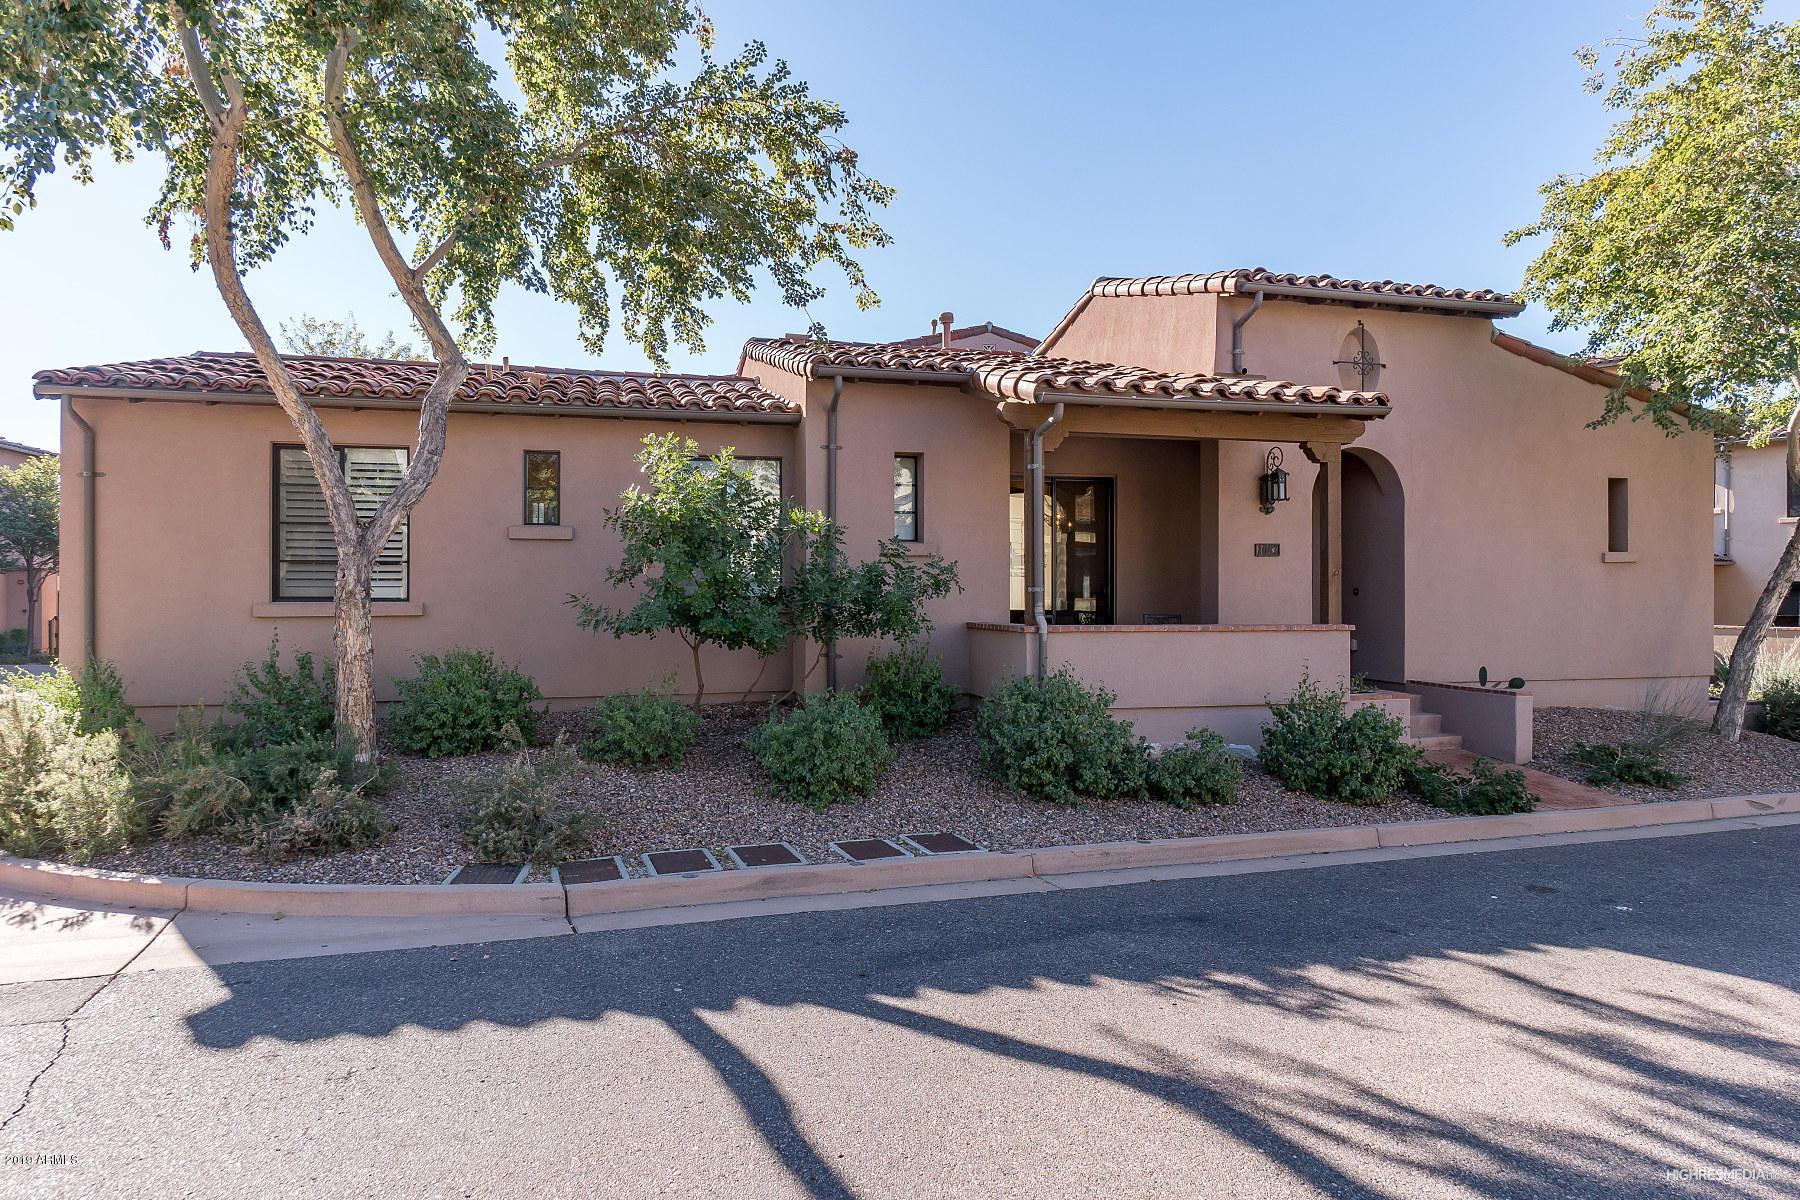 Photo of 18650 N THOMPSON PEAK Parkway #1083, Scottsdale, AZ 85255